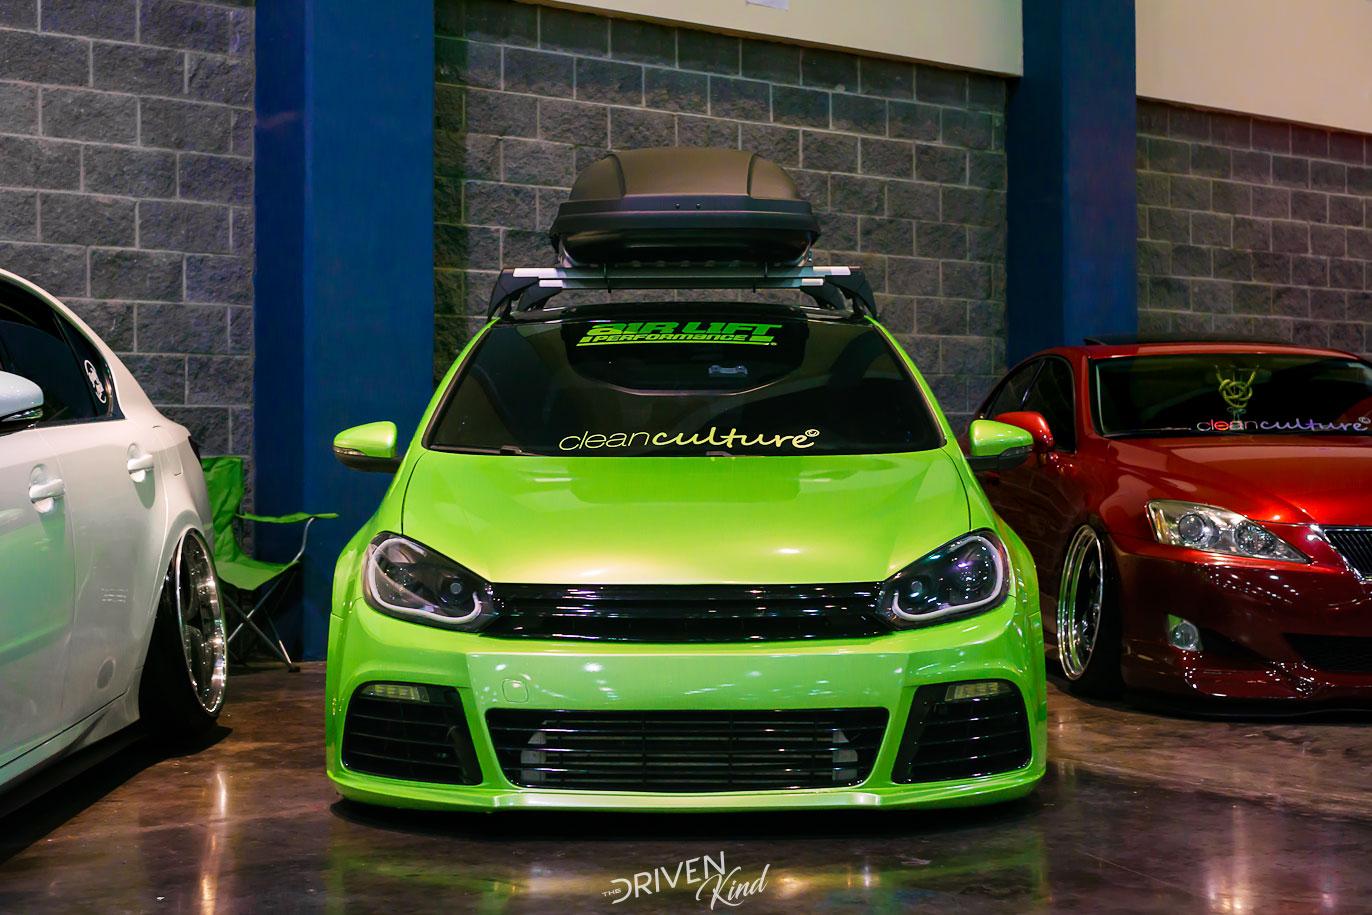 VW GTI STANCENATION FLORIDA PALM BEACH CONVENTION CENTER 2017 Pt. 2 The Driven Kind Coverage